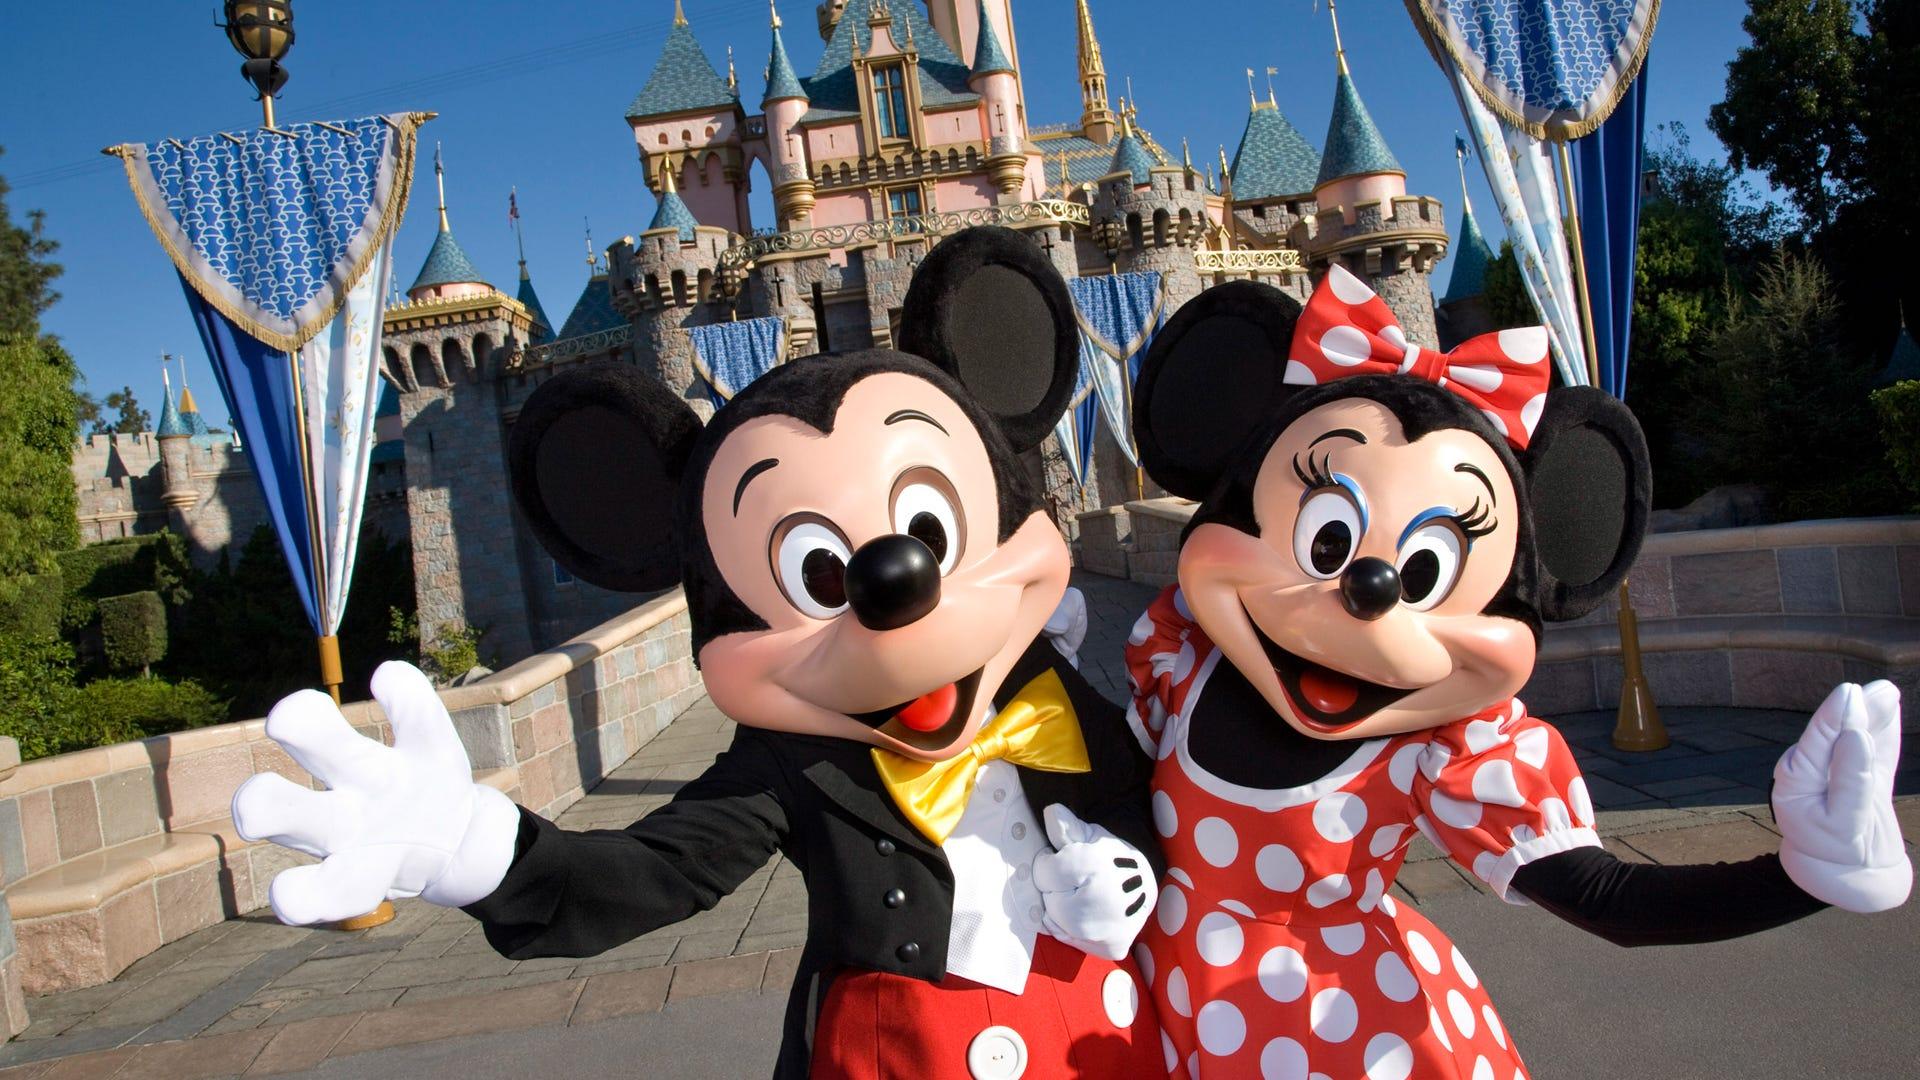 17 money-saving Disney World and Disneyland hacks to try